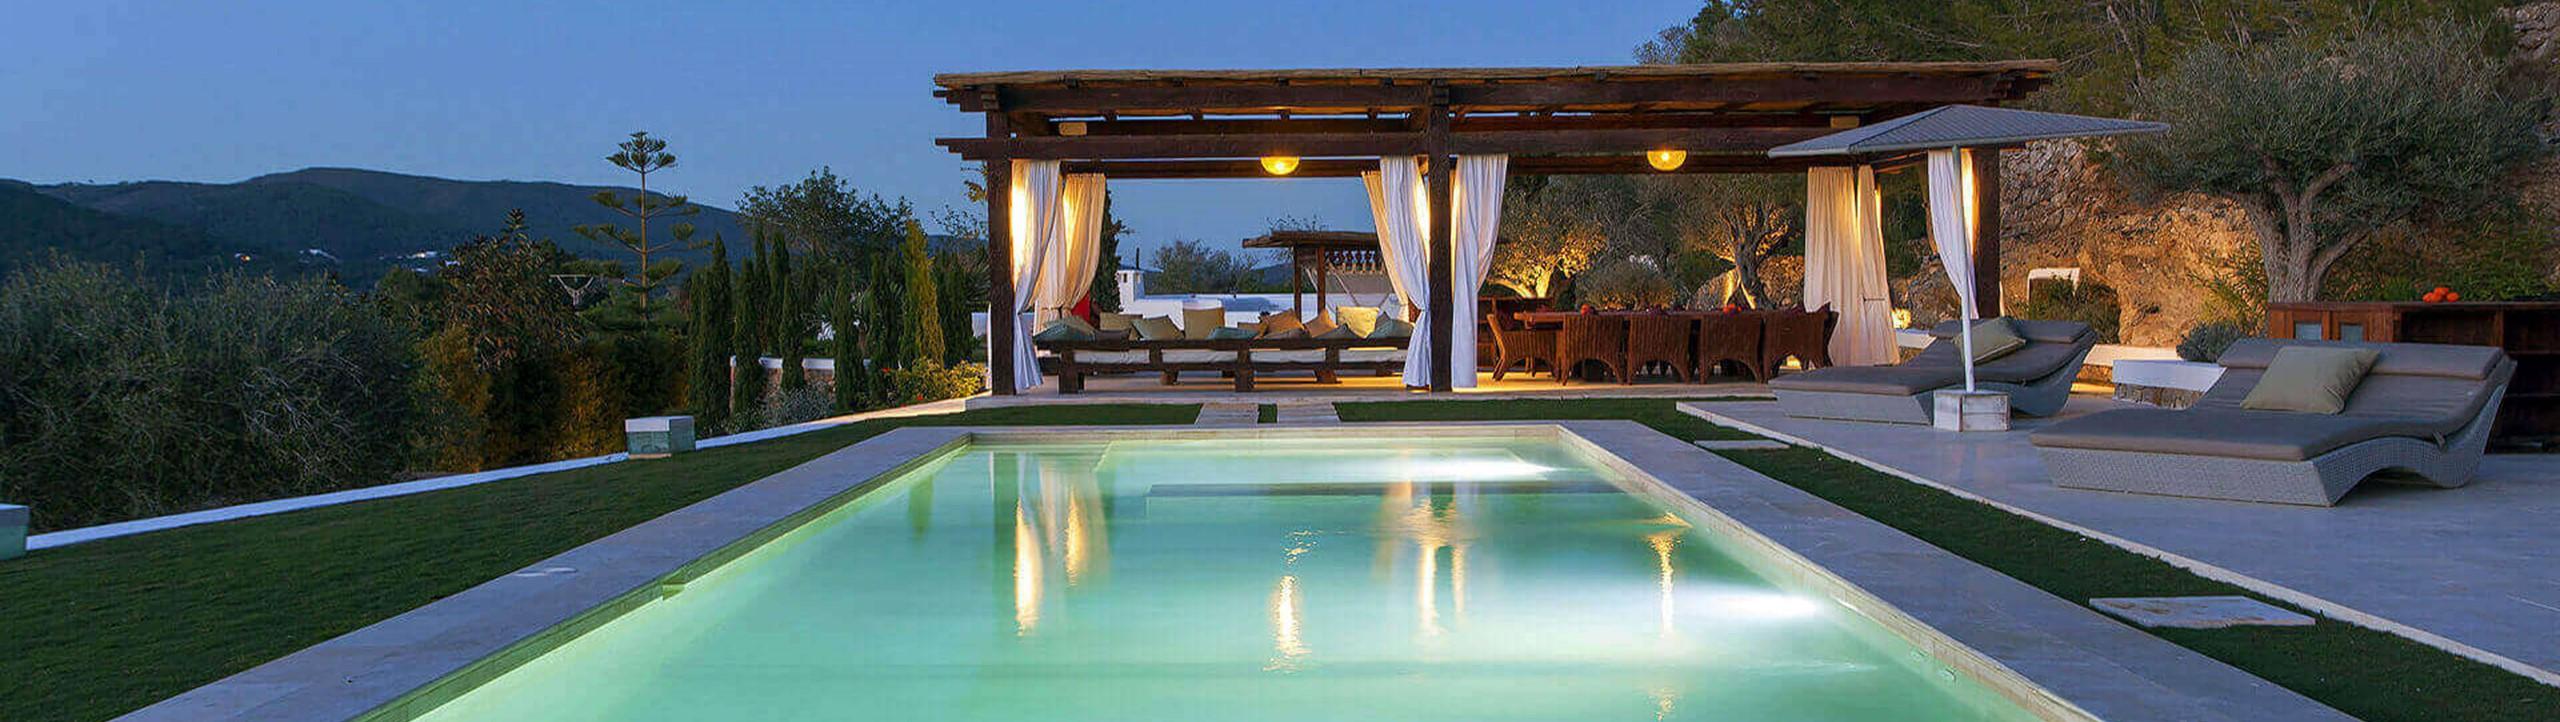 Villa Bes Ibiza 1 San Lorenzo